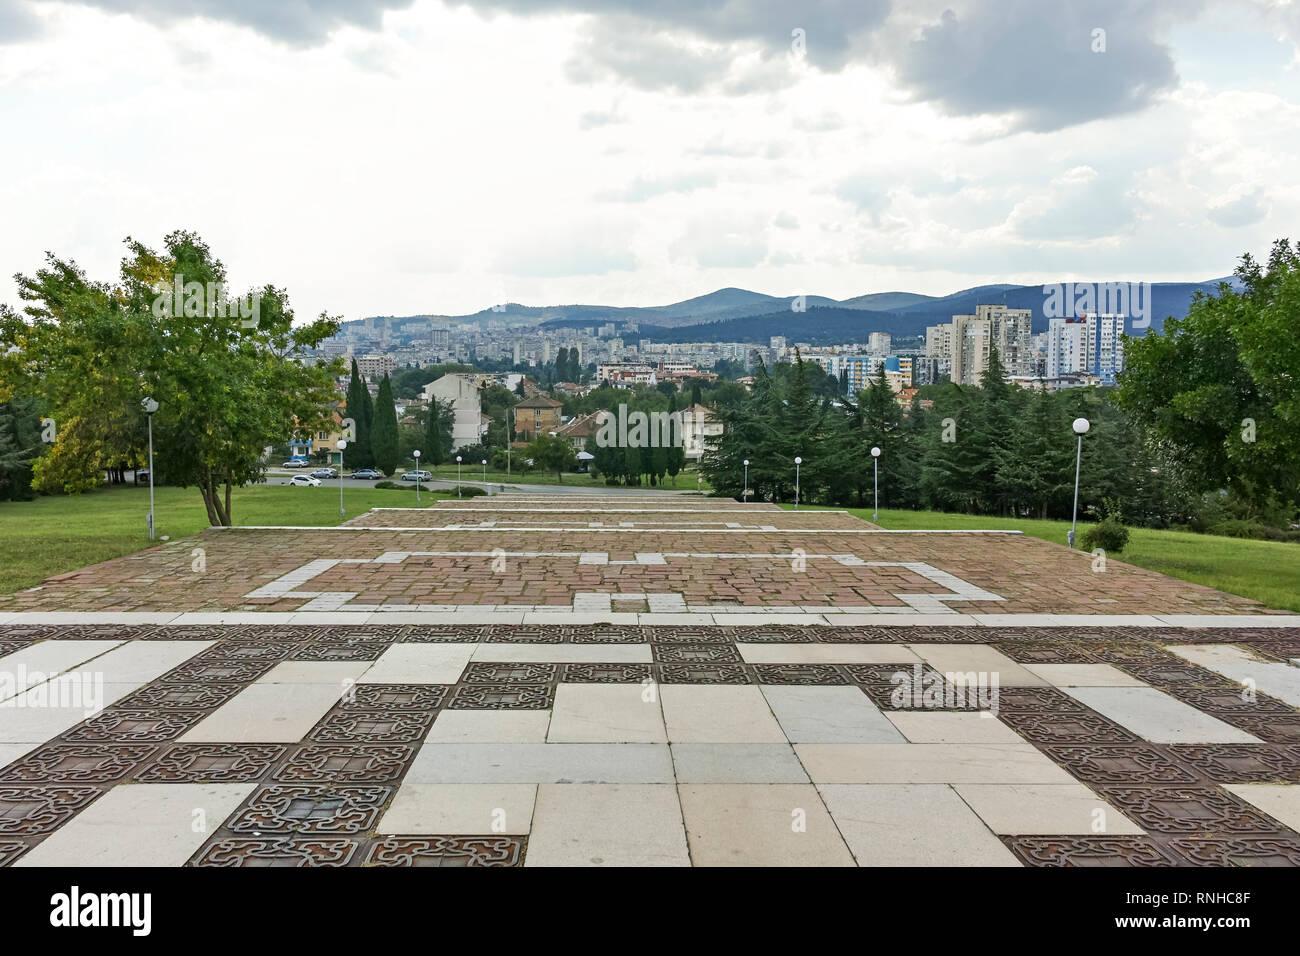 Whores in Stara Zagora